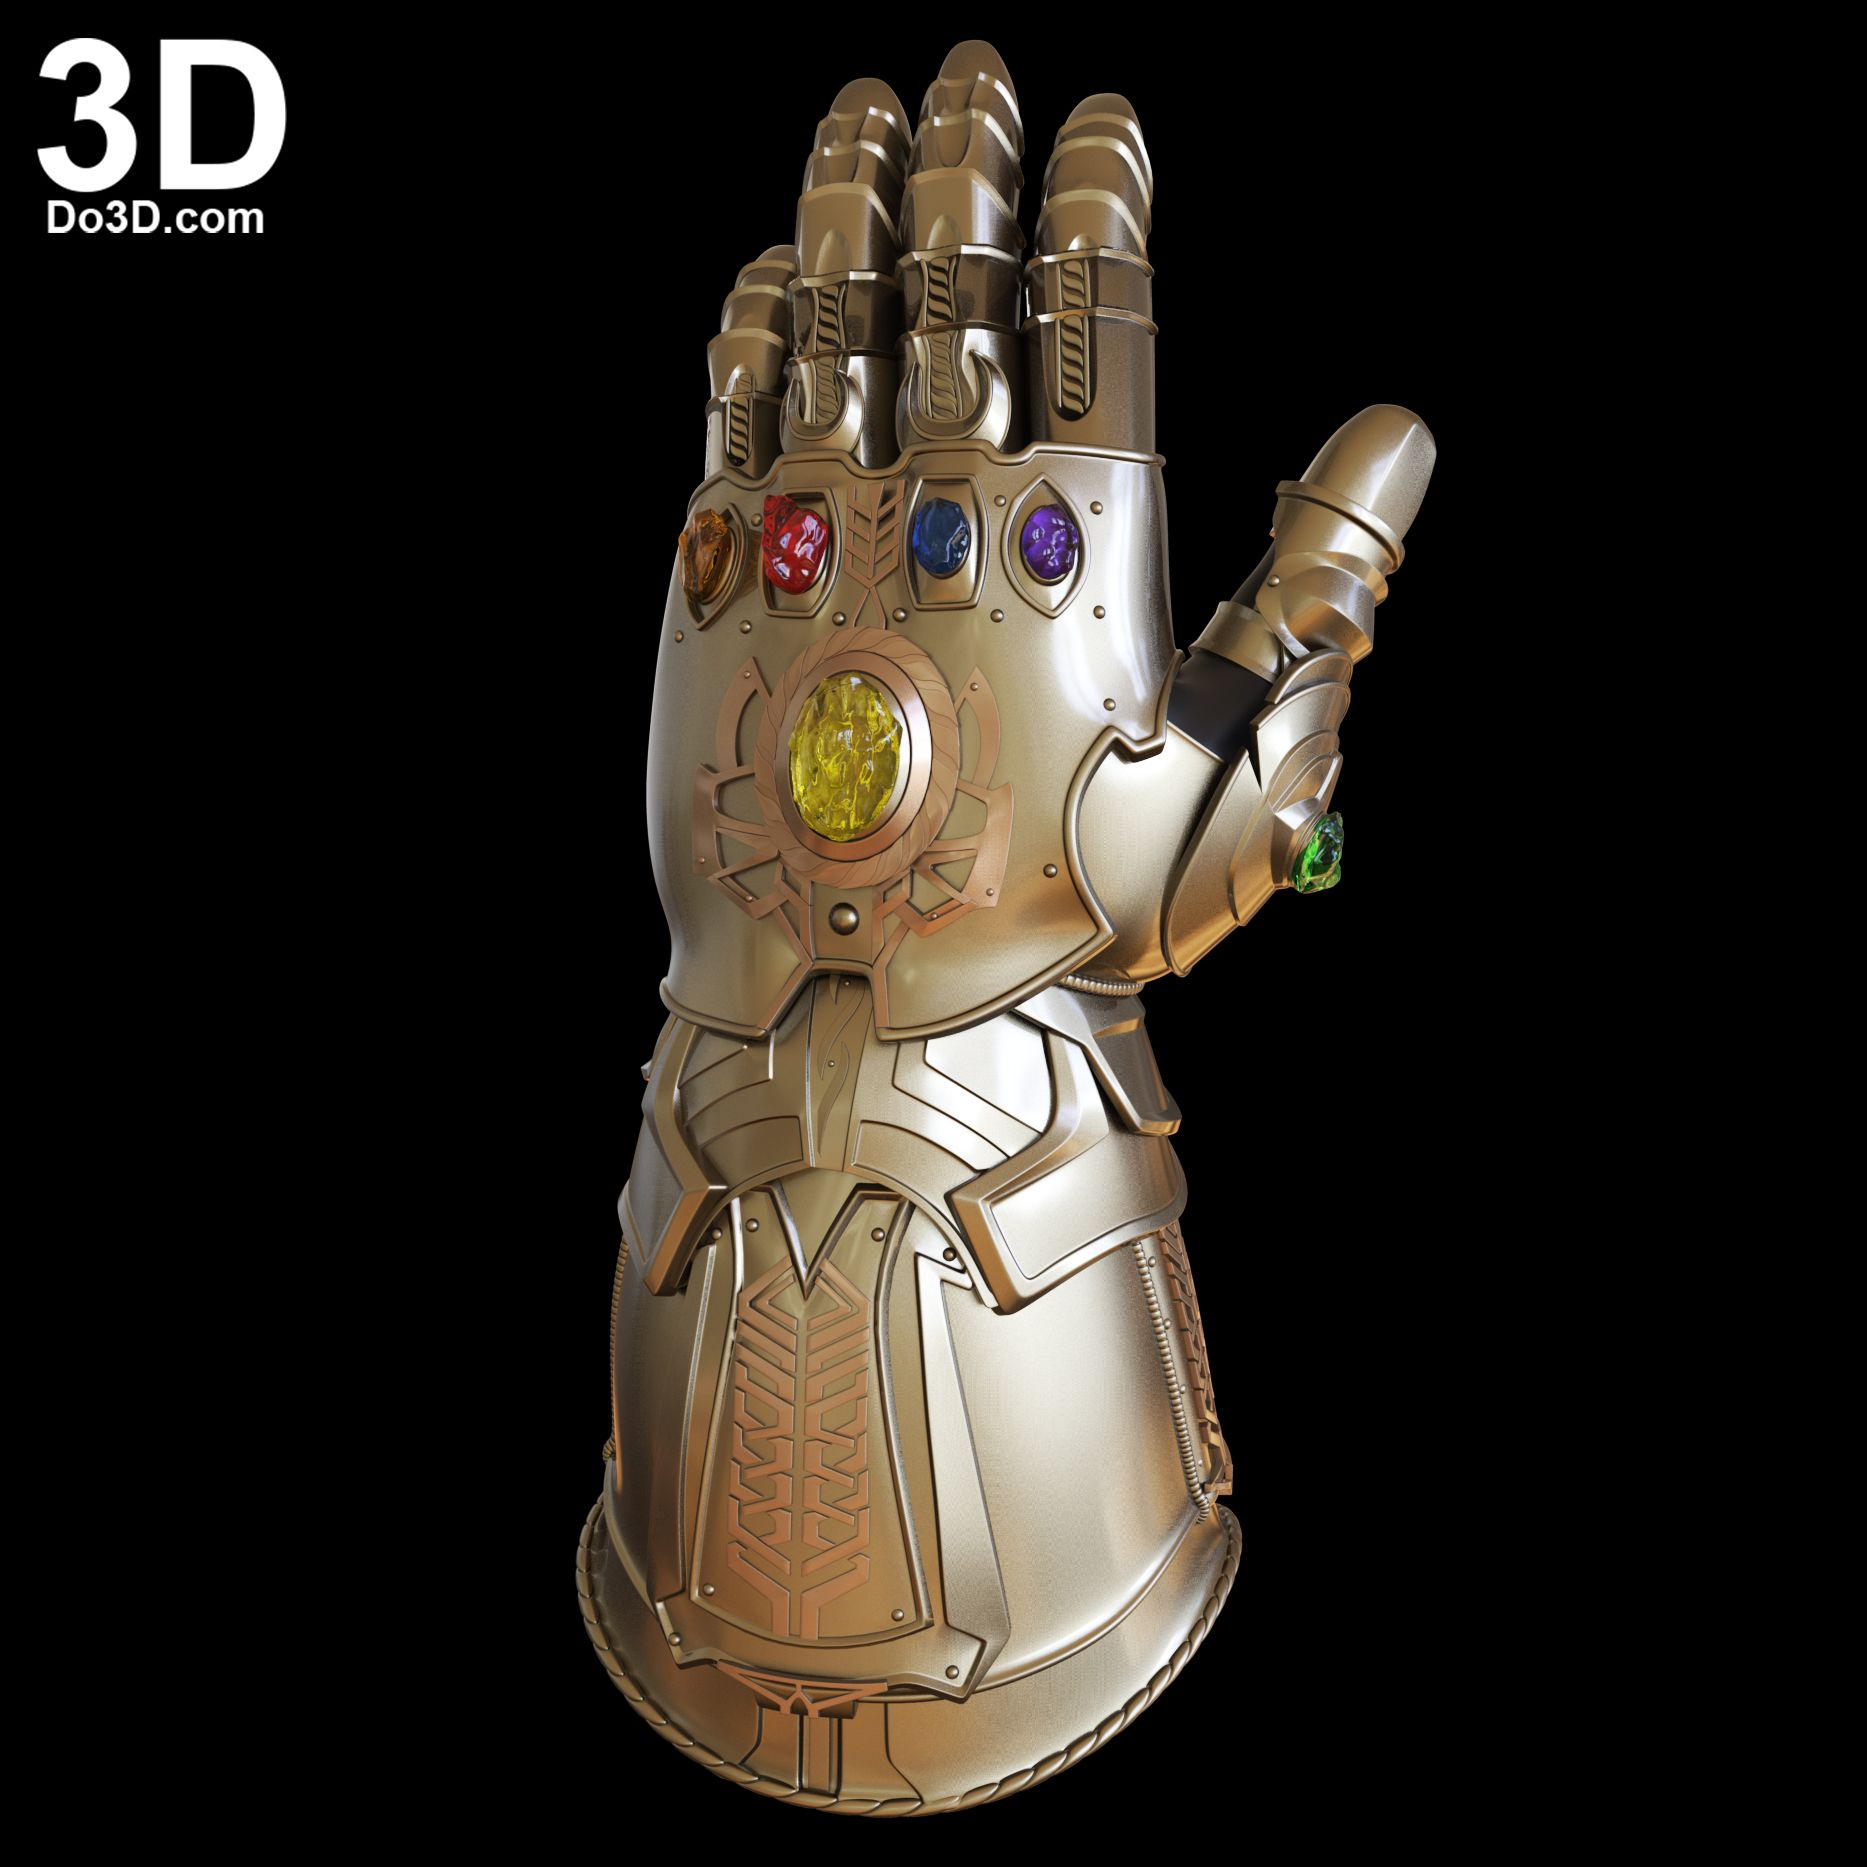 3d Printable Model Thanos Gauntlet Forearm Glove D23 Avengers Infinity War Version Print File Format 3d Printable Models Avengers Infinity War Gloves